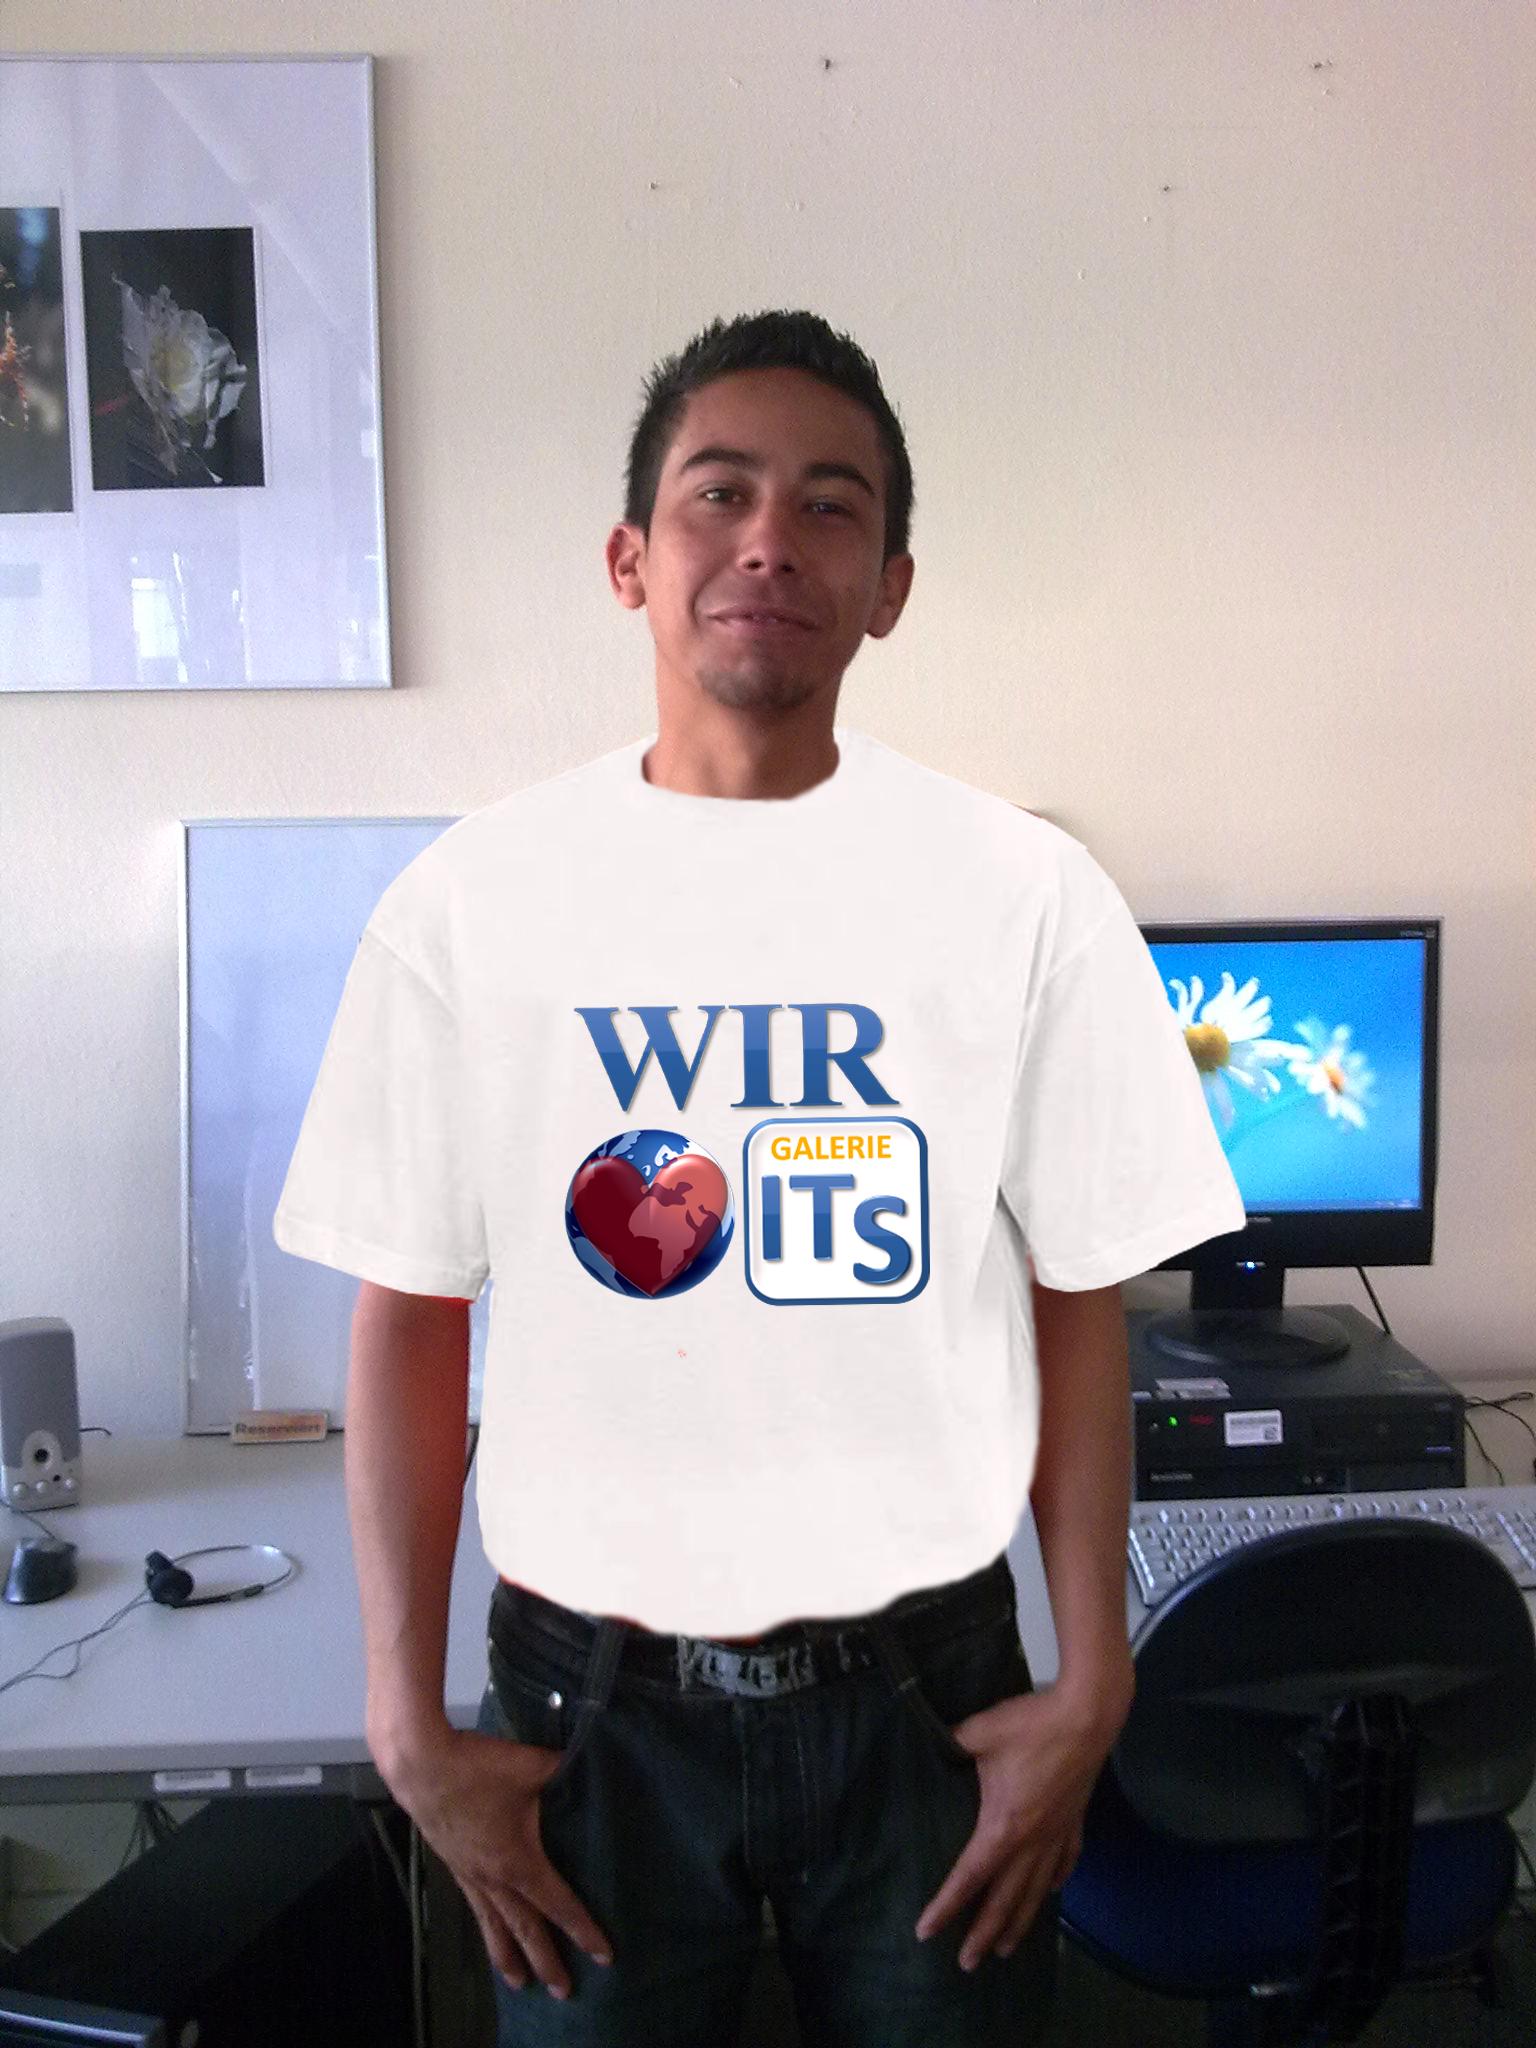 Eldo trägt das T-Shirt